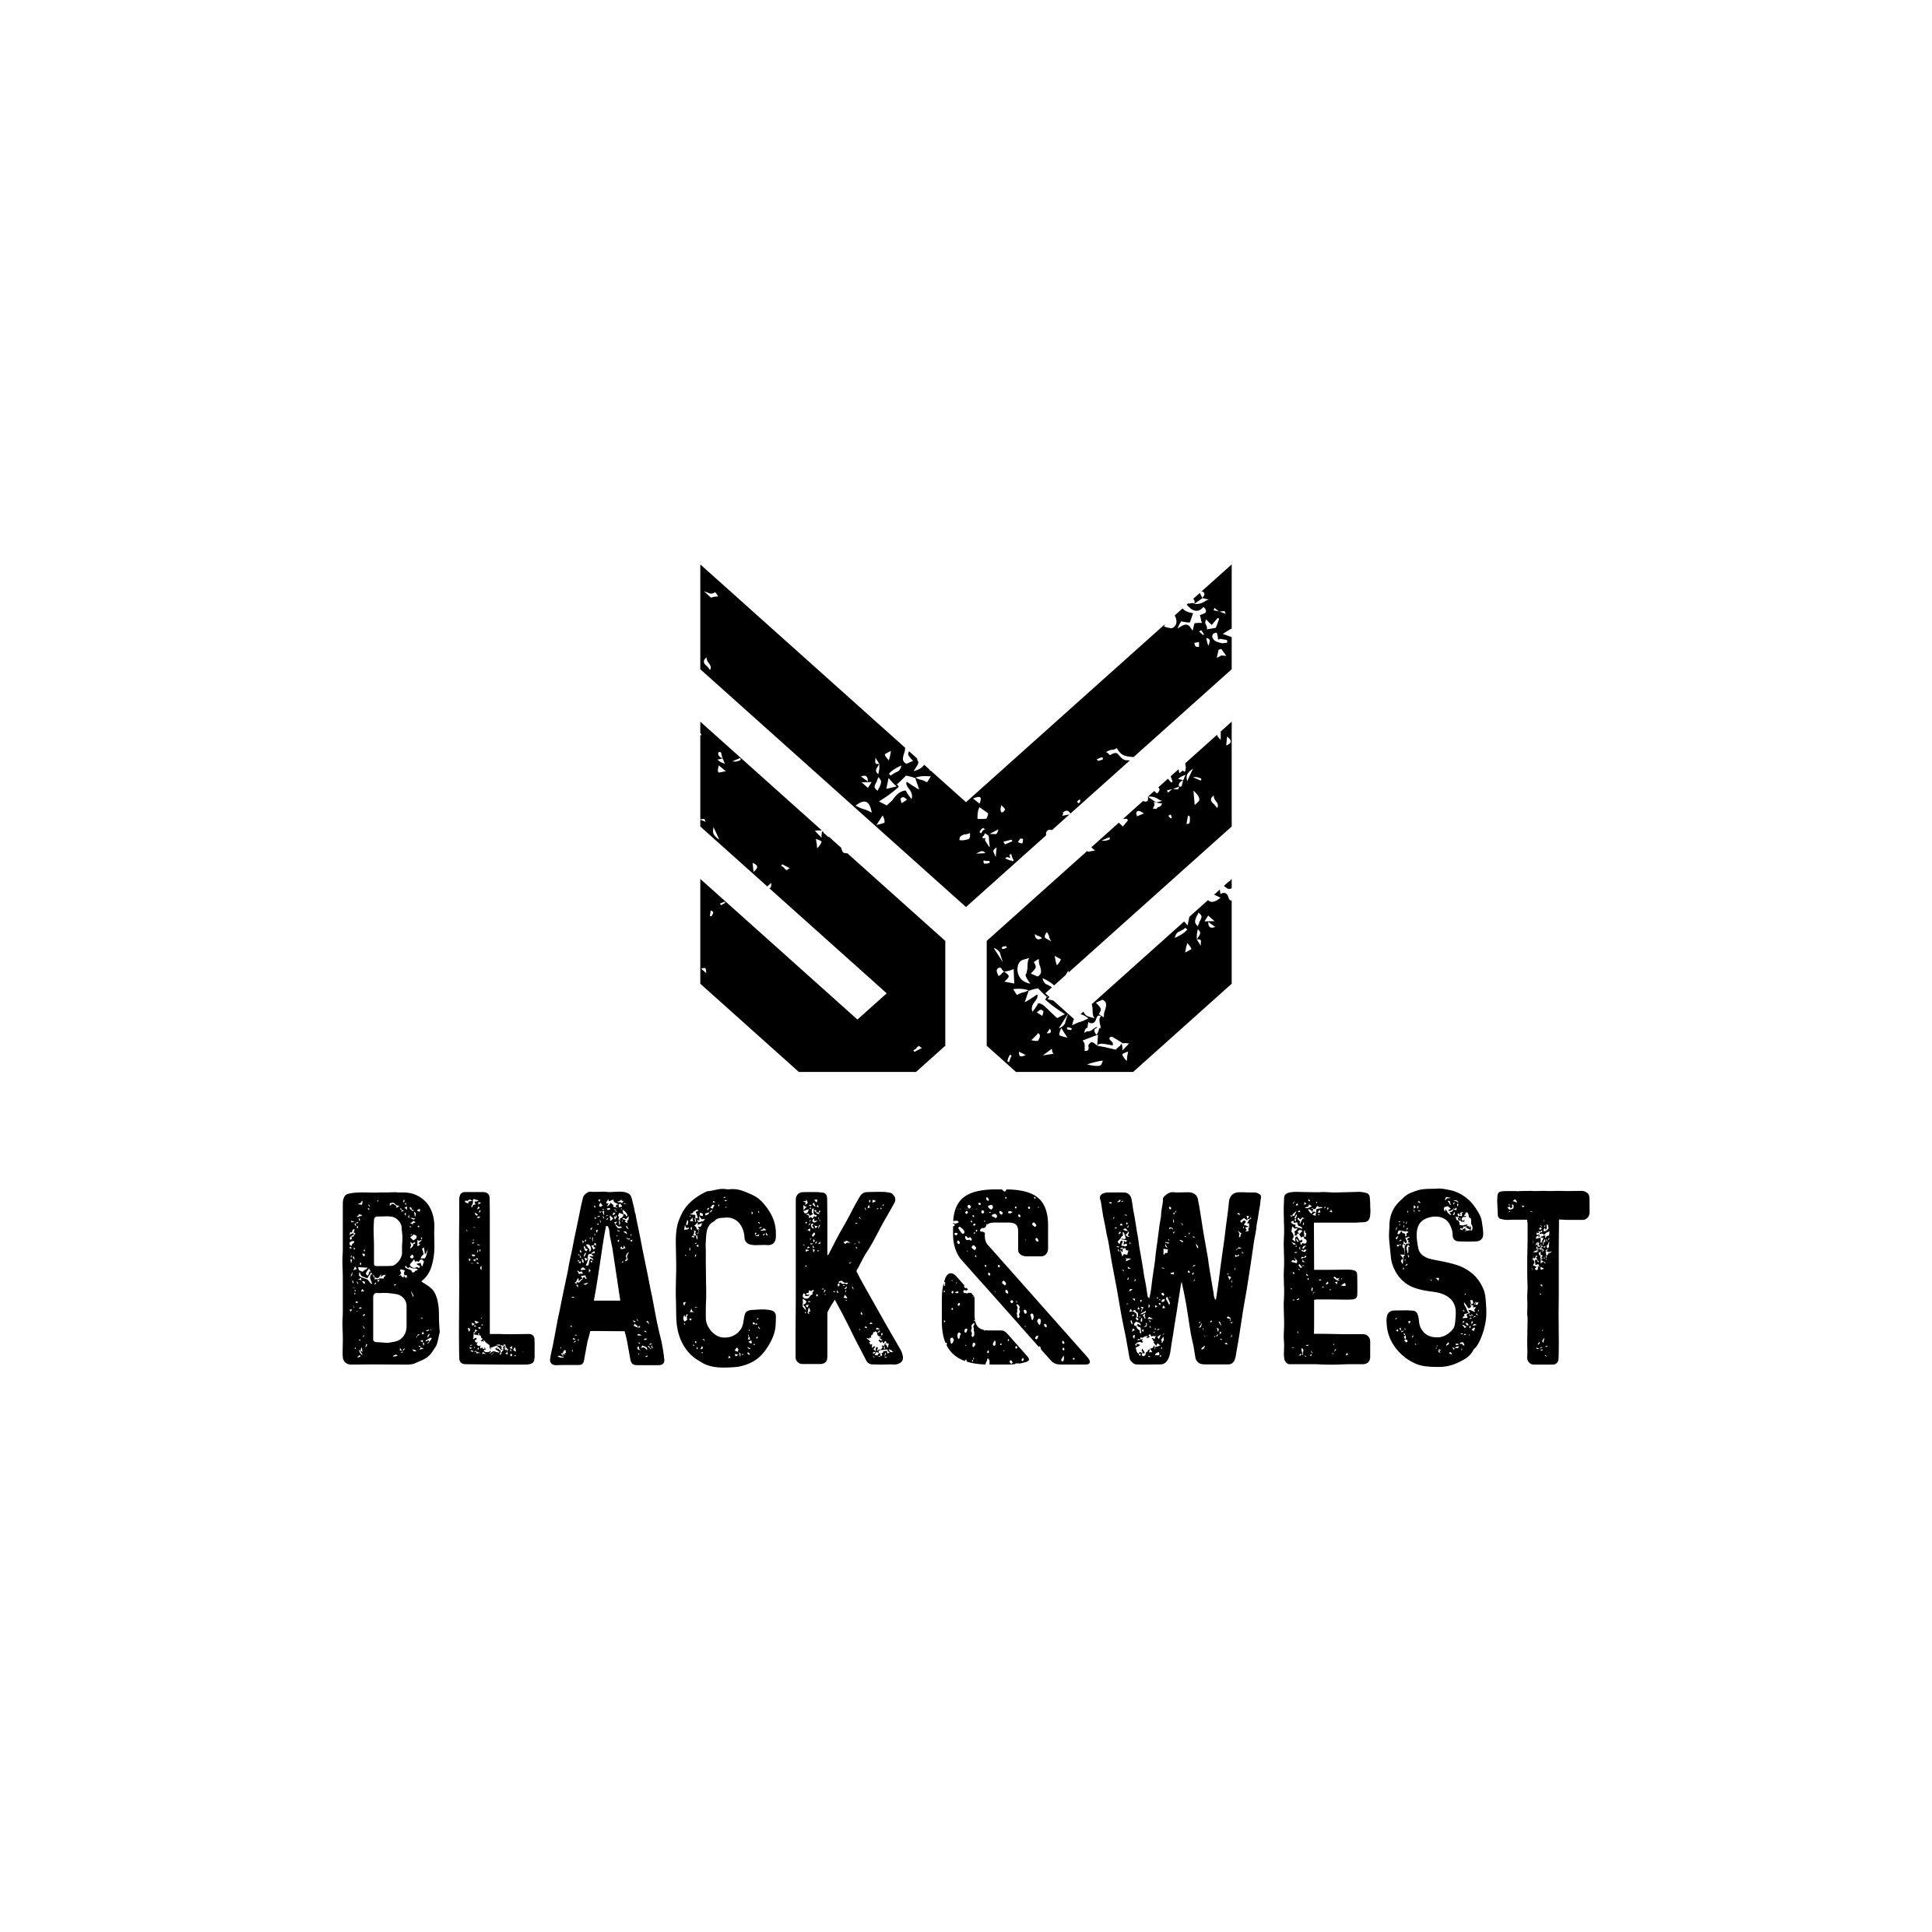 A logo for Black & West, a french luxury streetwear brand